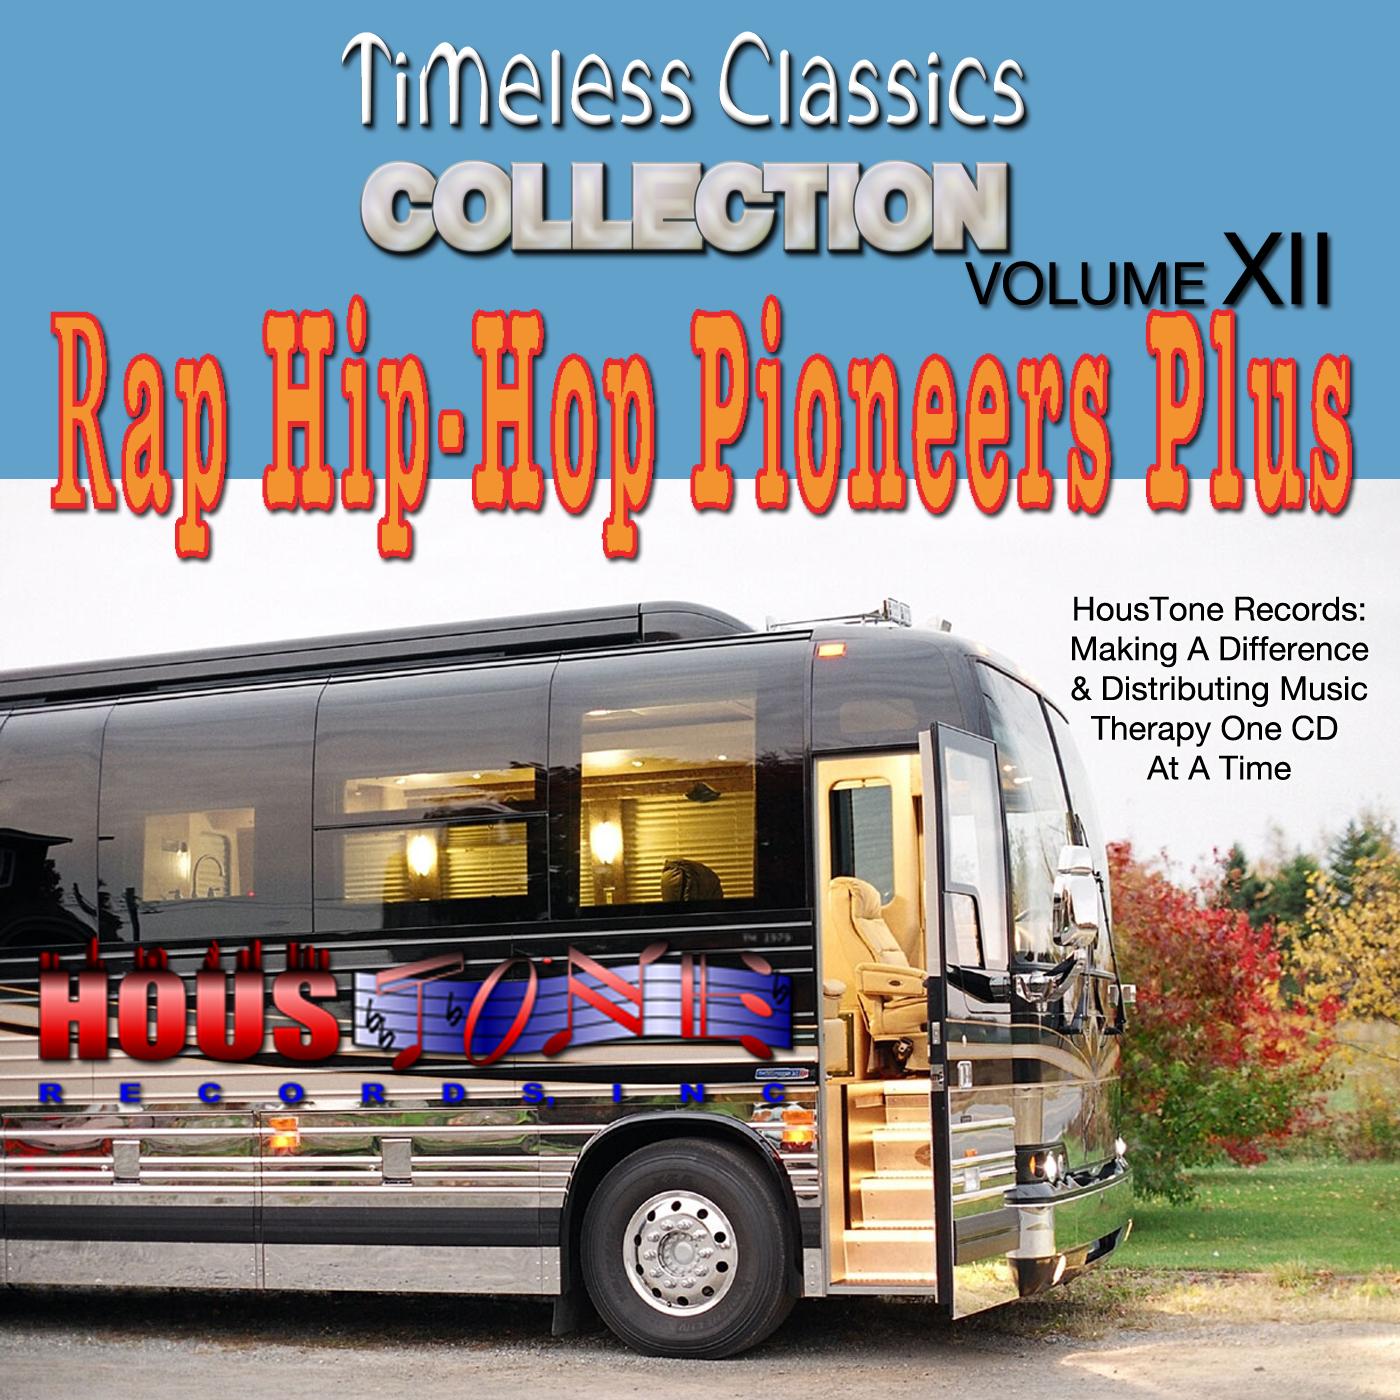 TIMELESS CLASSICS VOLUME XII RAP HIP HOP PIONEERS PLUS